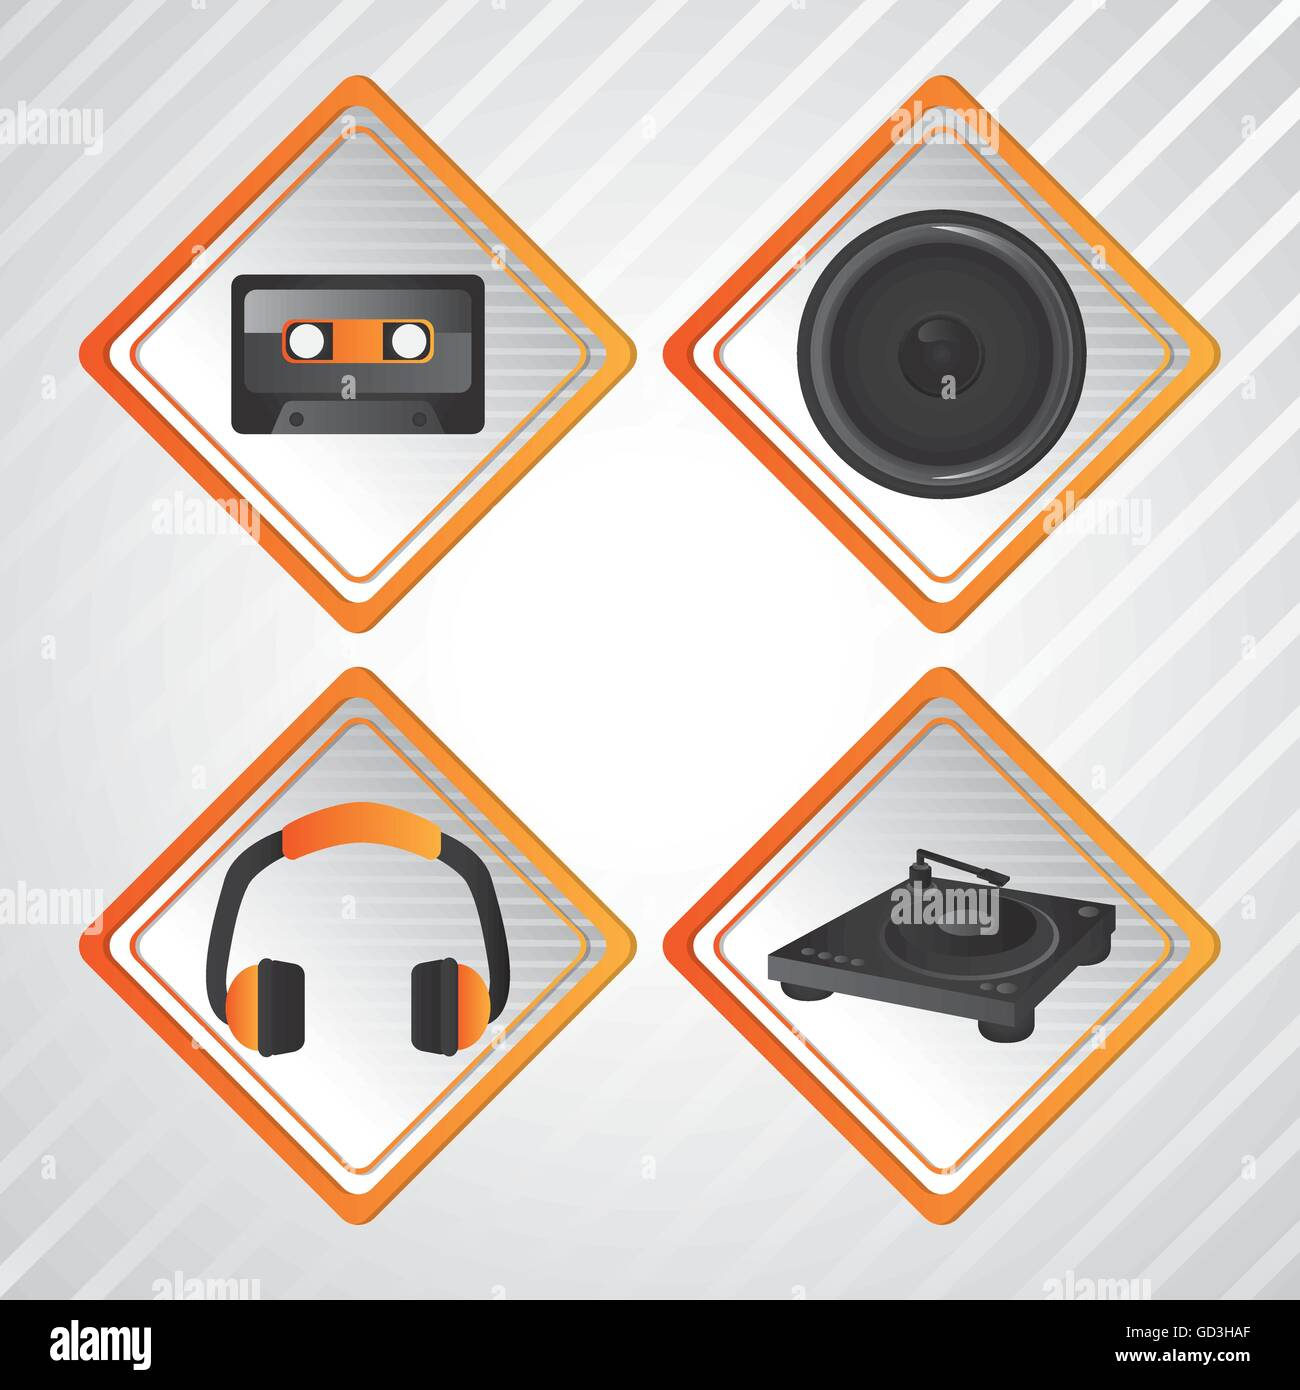 Headphone Icon Dance Music Design Stockfotos & Headphone Icon Dance ...